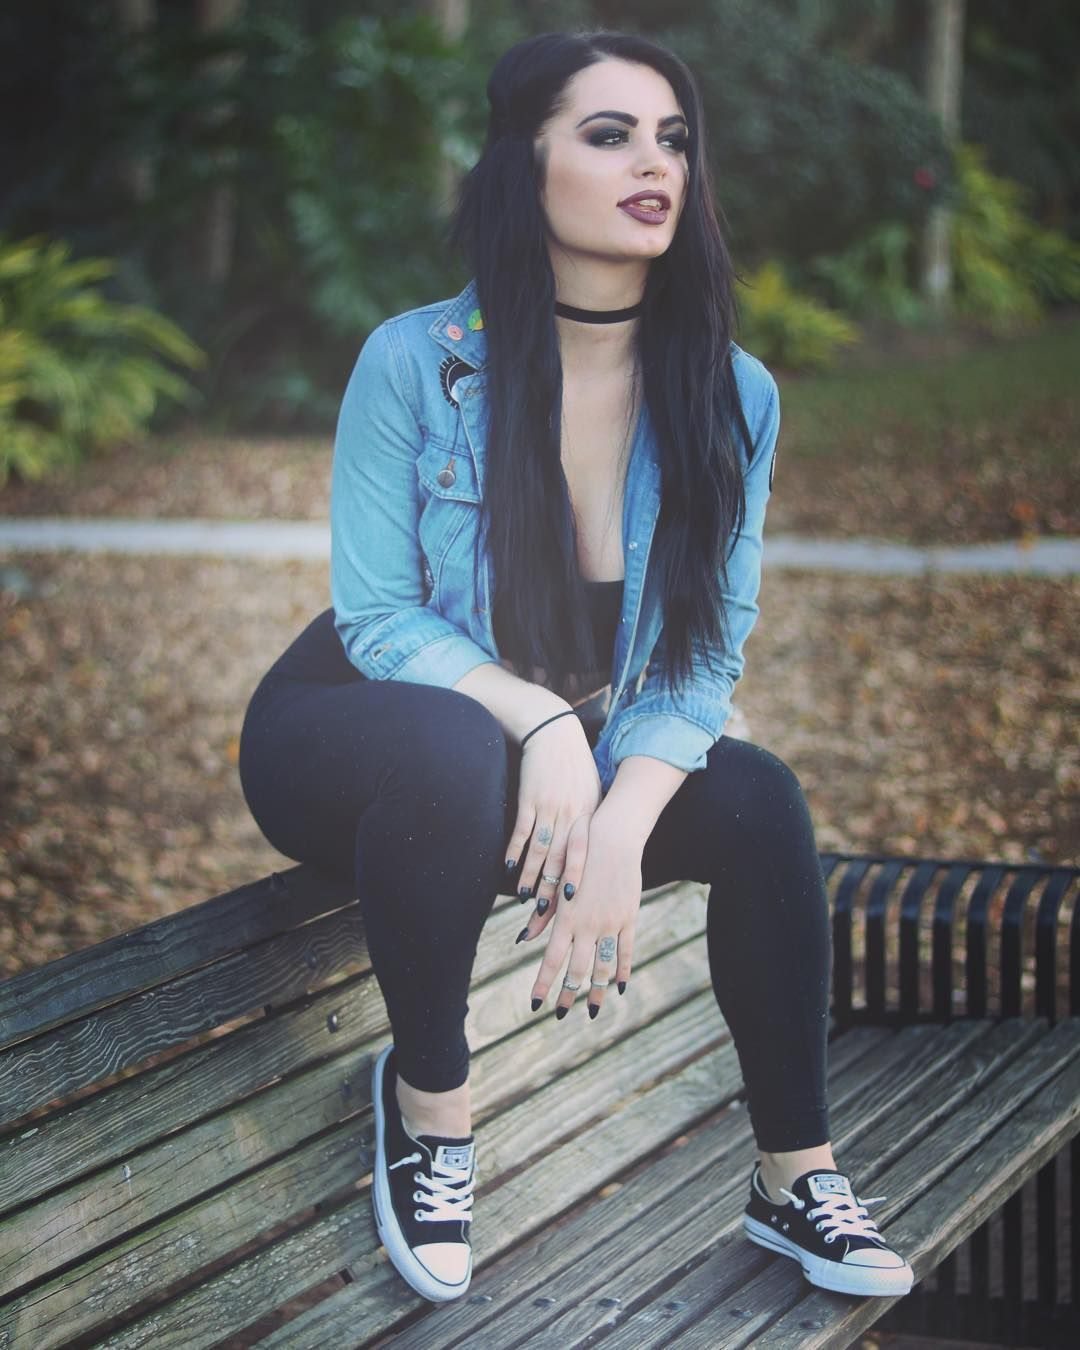 Instagram Saraya-Jade Rodriguez